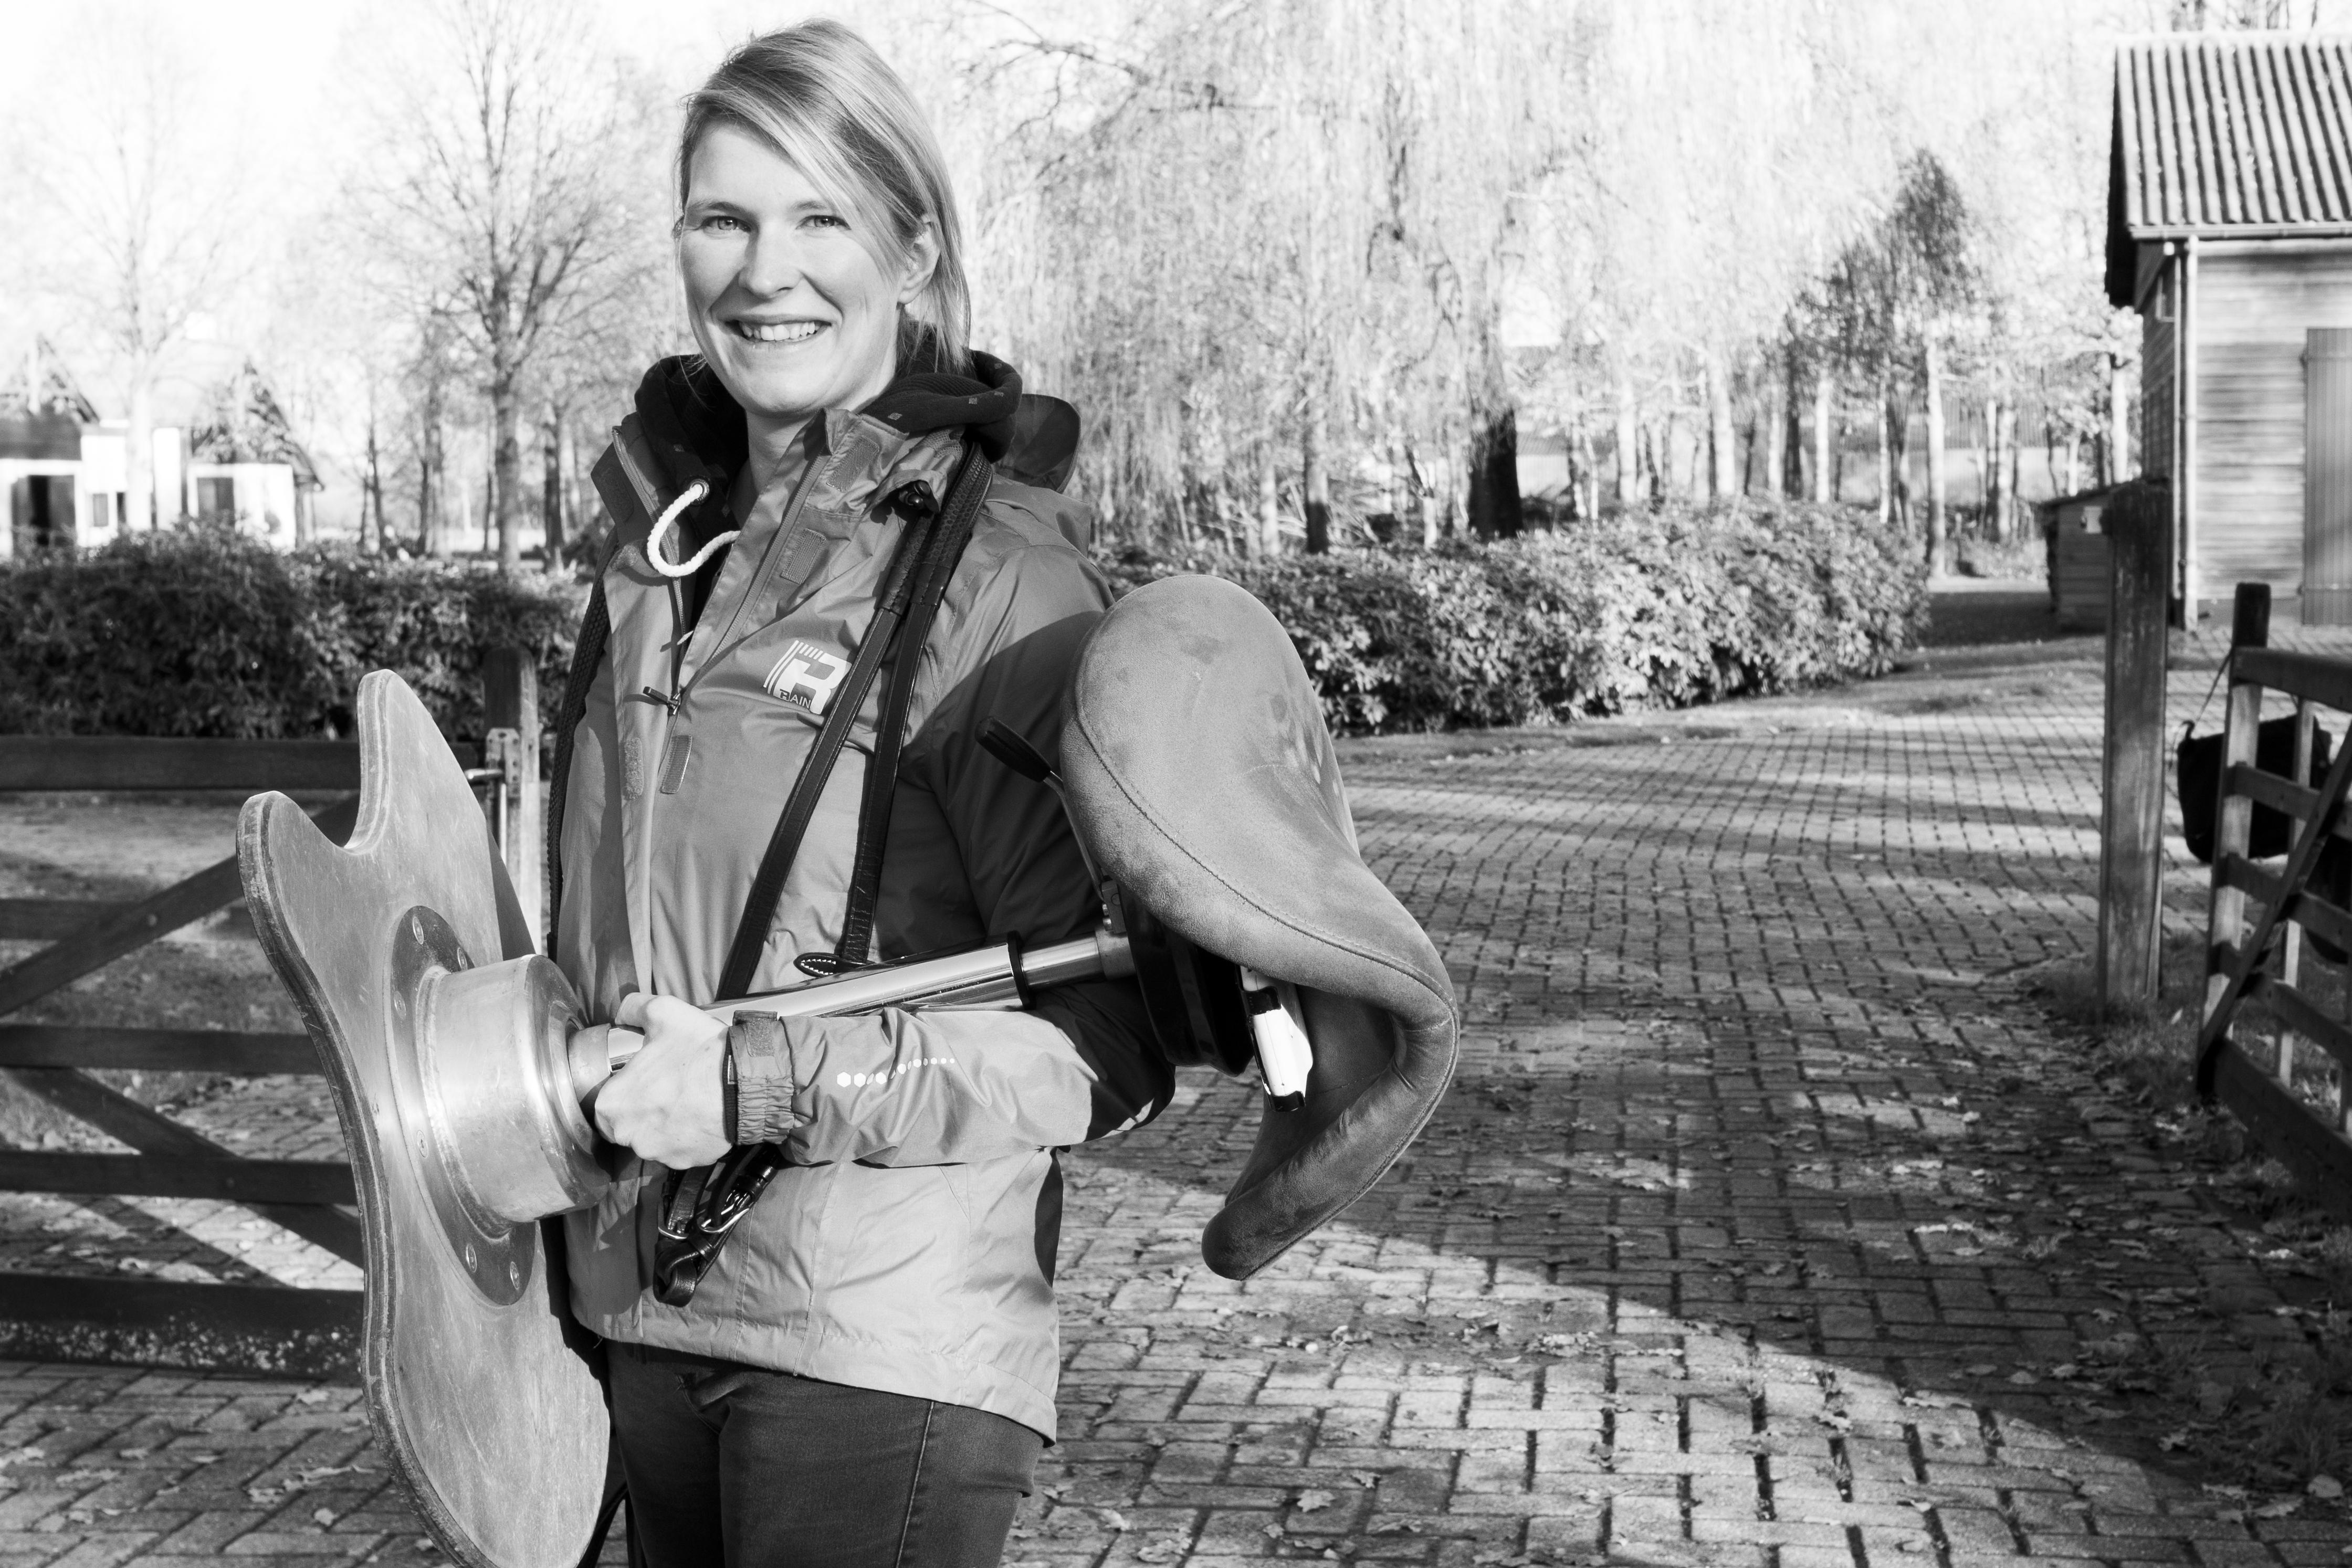 Saskia Heijkants